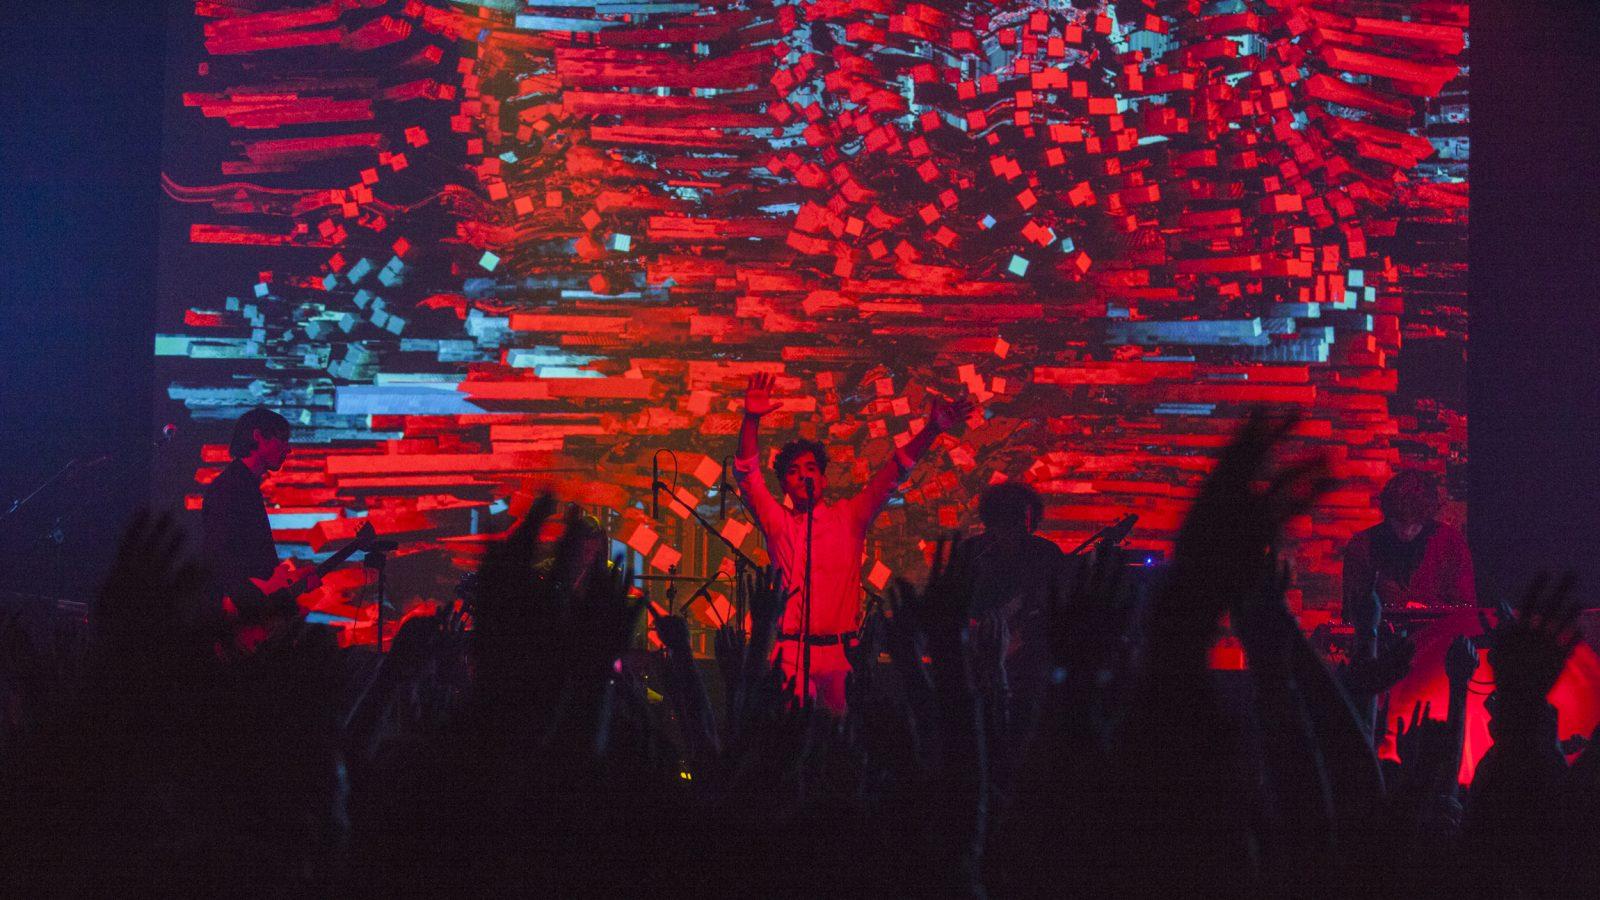 Neon Indian Music Technology Viual Arts